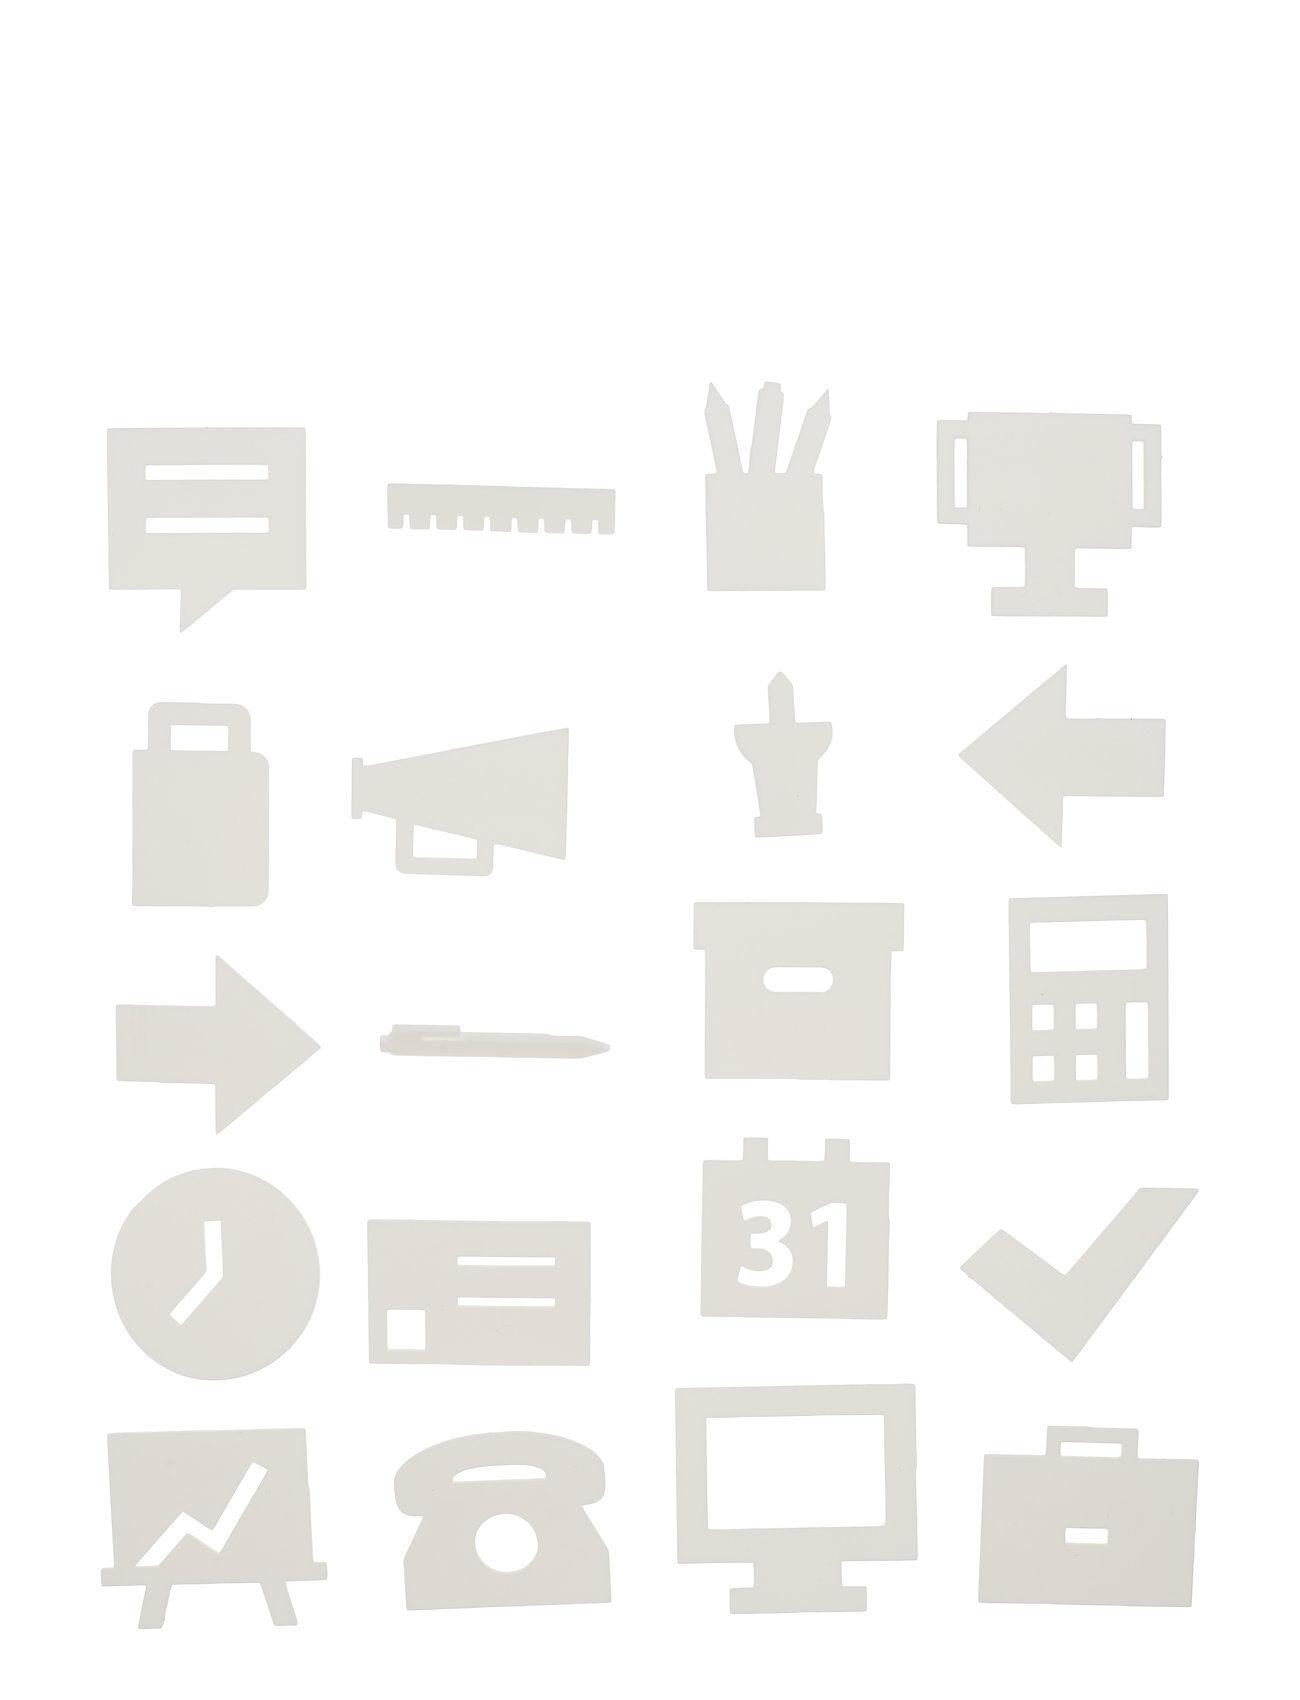 Design Letters Office Icons, For Message Board Kodin Sisustus Hopea Design Letters